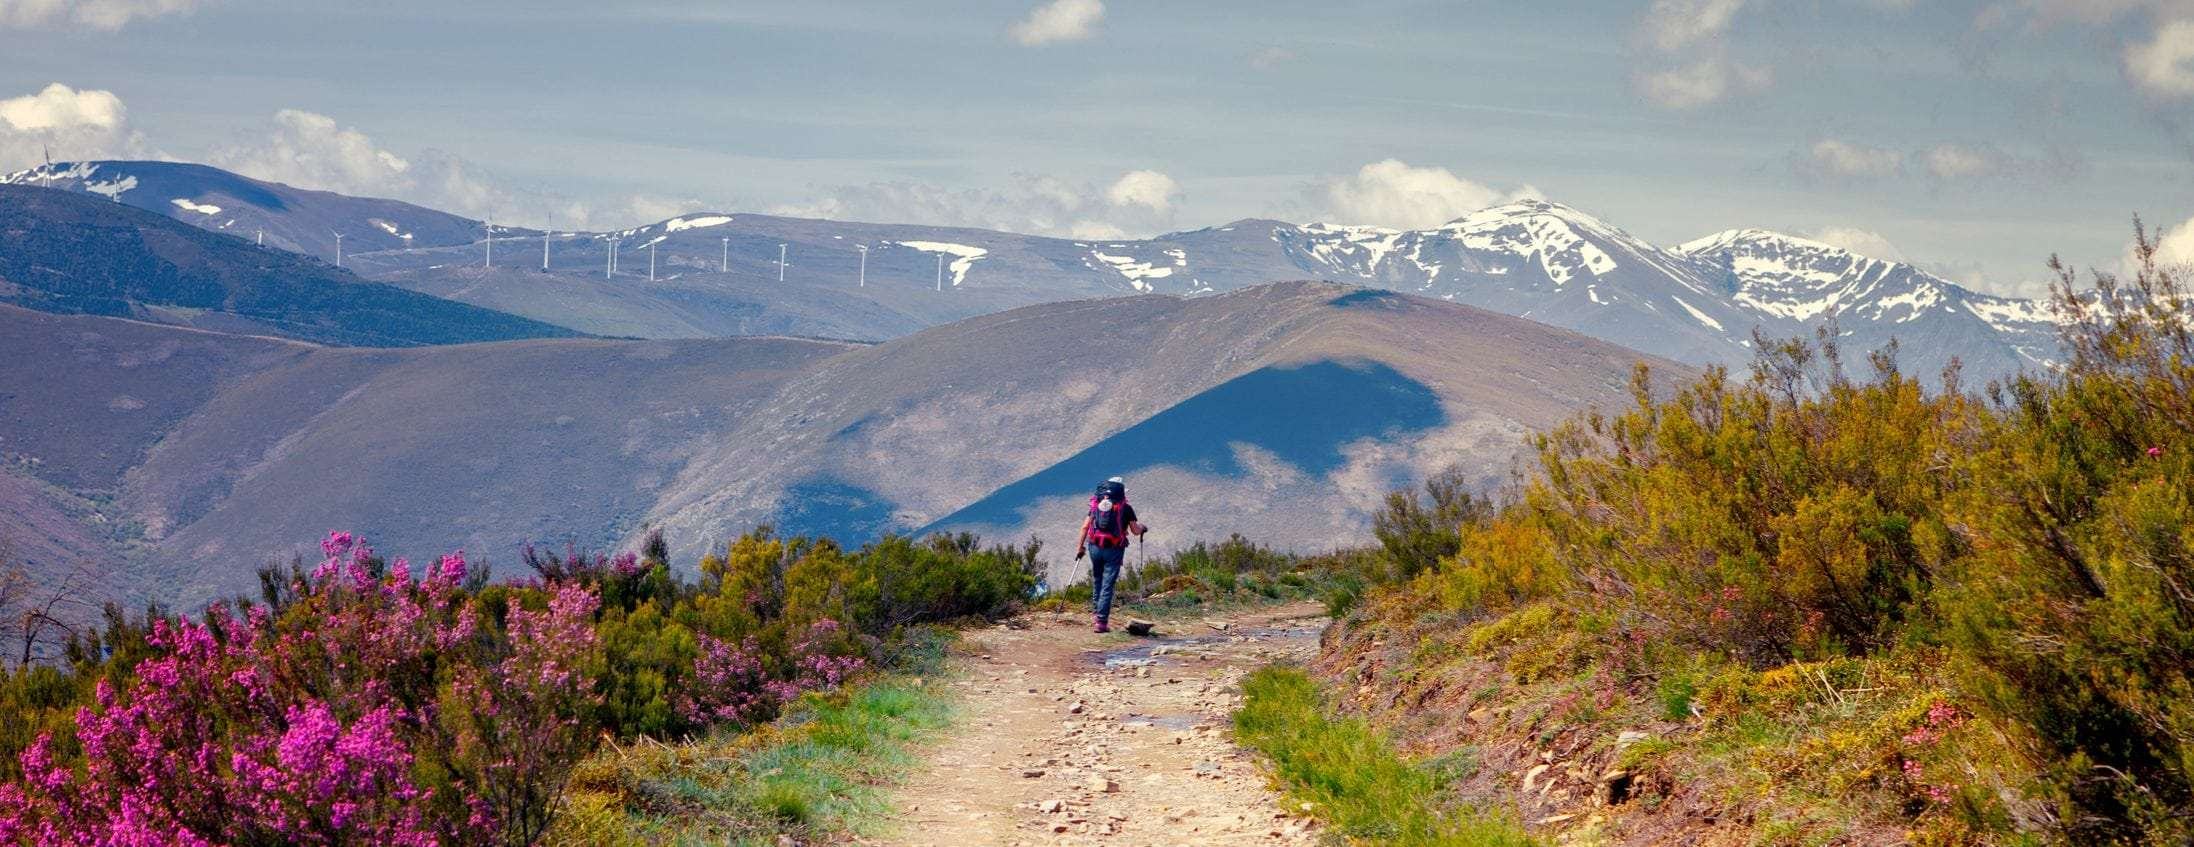 Full Camino Frances: St Jean Pied de Port to Santiago 29